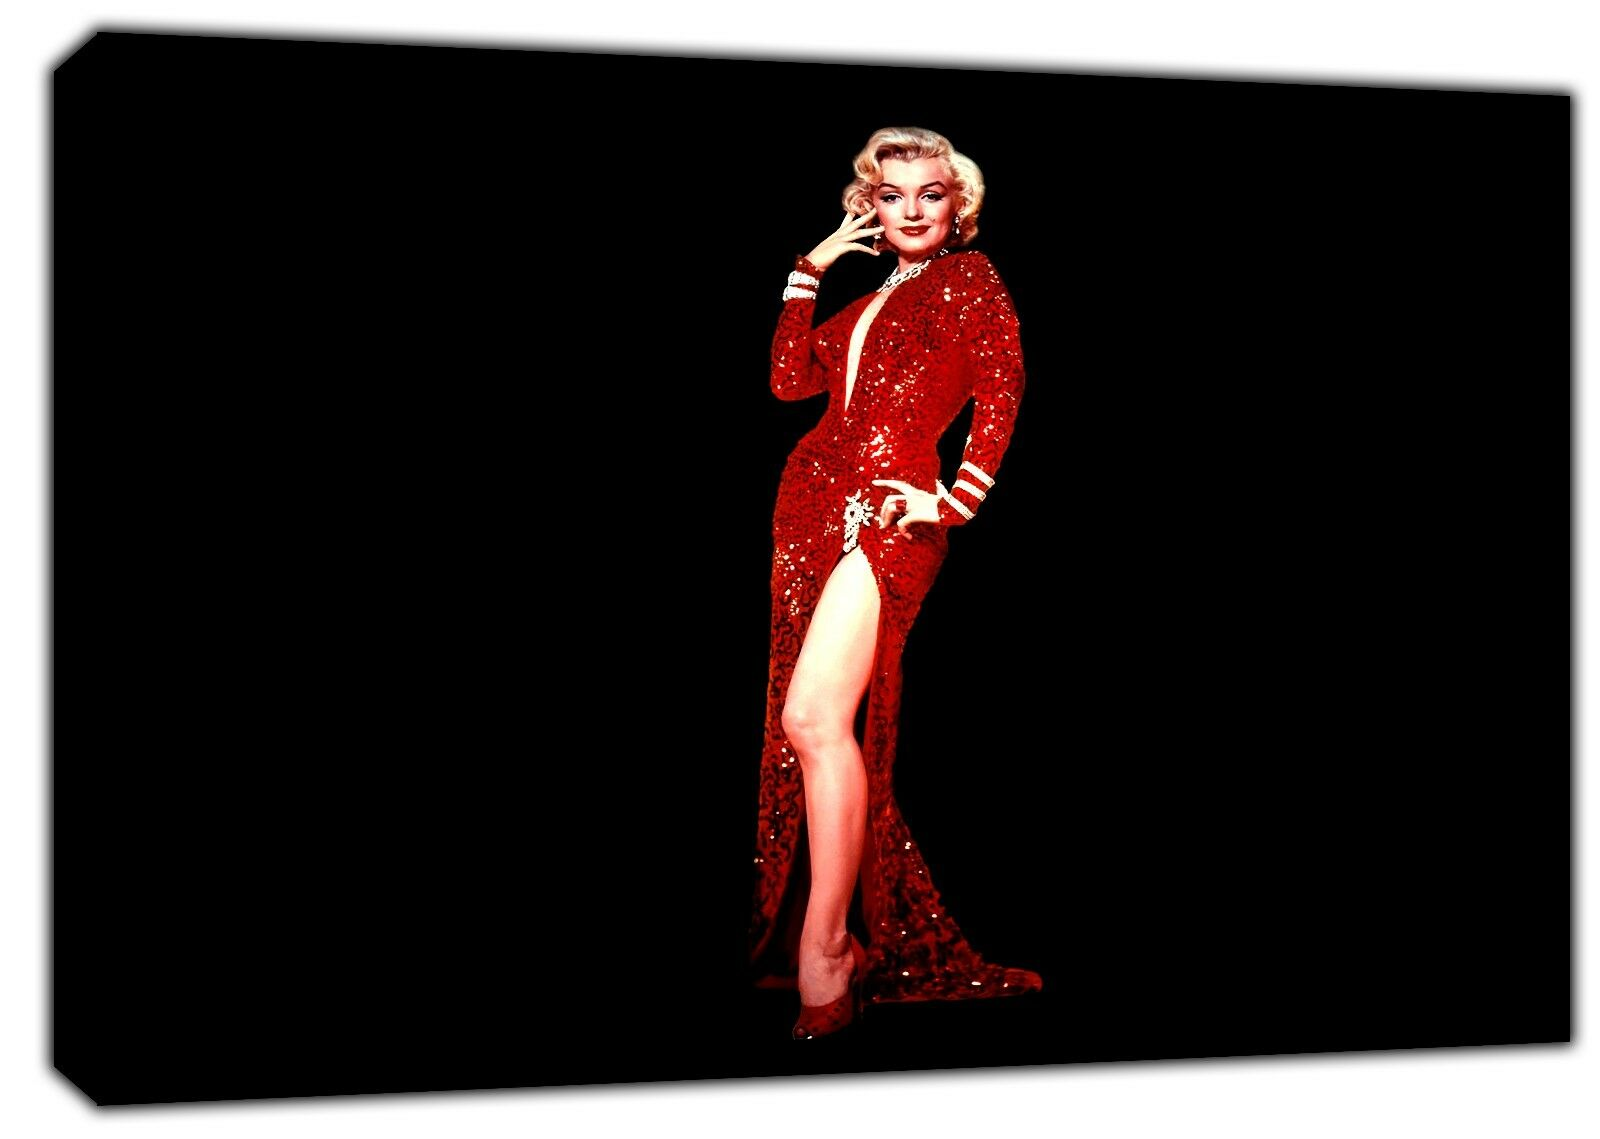 Marilyn Monroe en rojo vestido de impresión impresión impresión de foto lienzo enmarcado en Decoración de parojo Arte 7afb1e